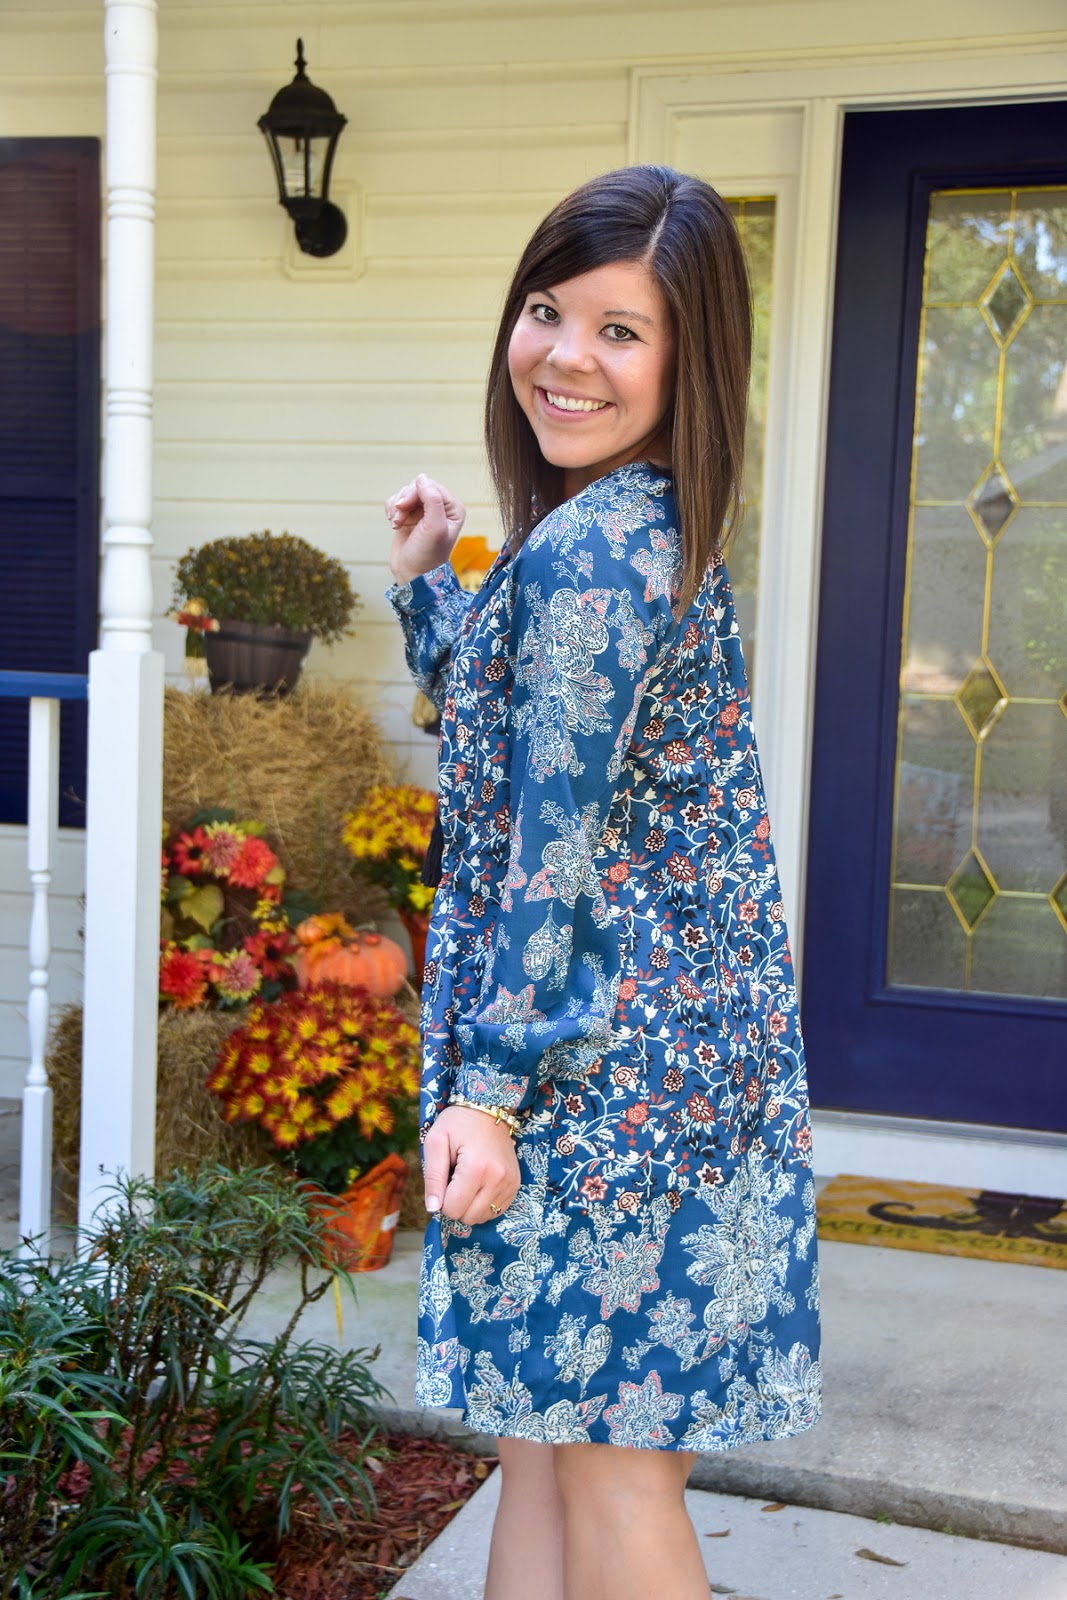 Boho Blues & The Cutest Dress Under $20!